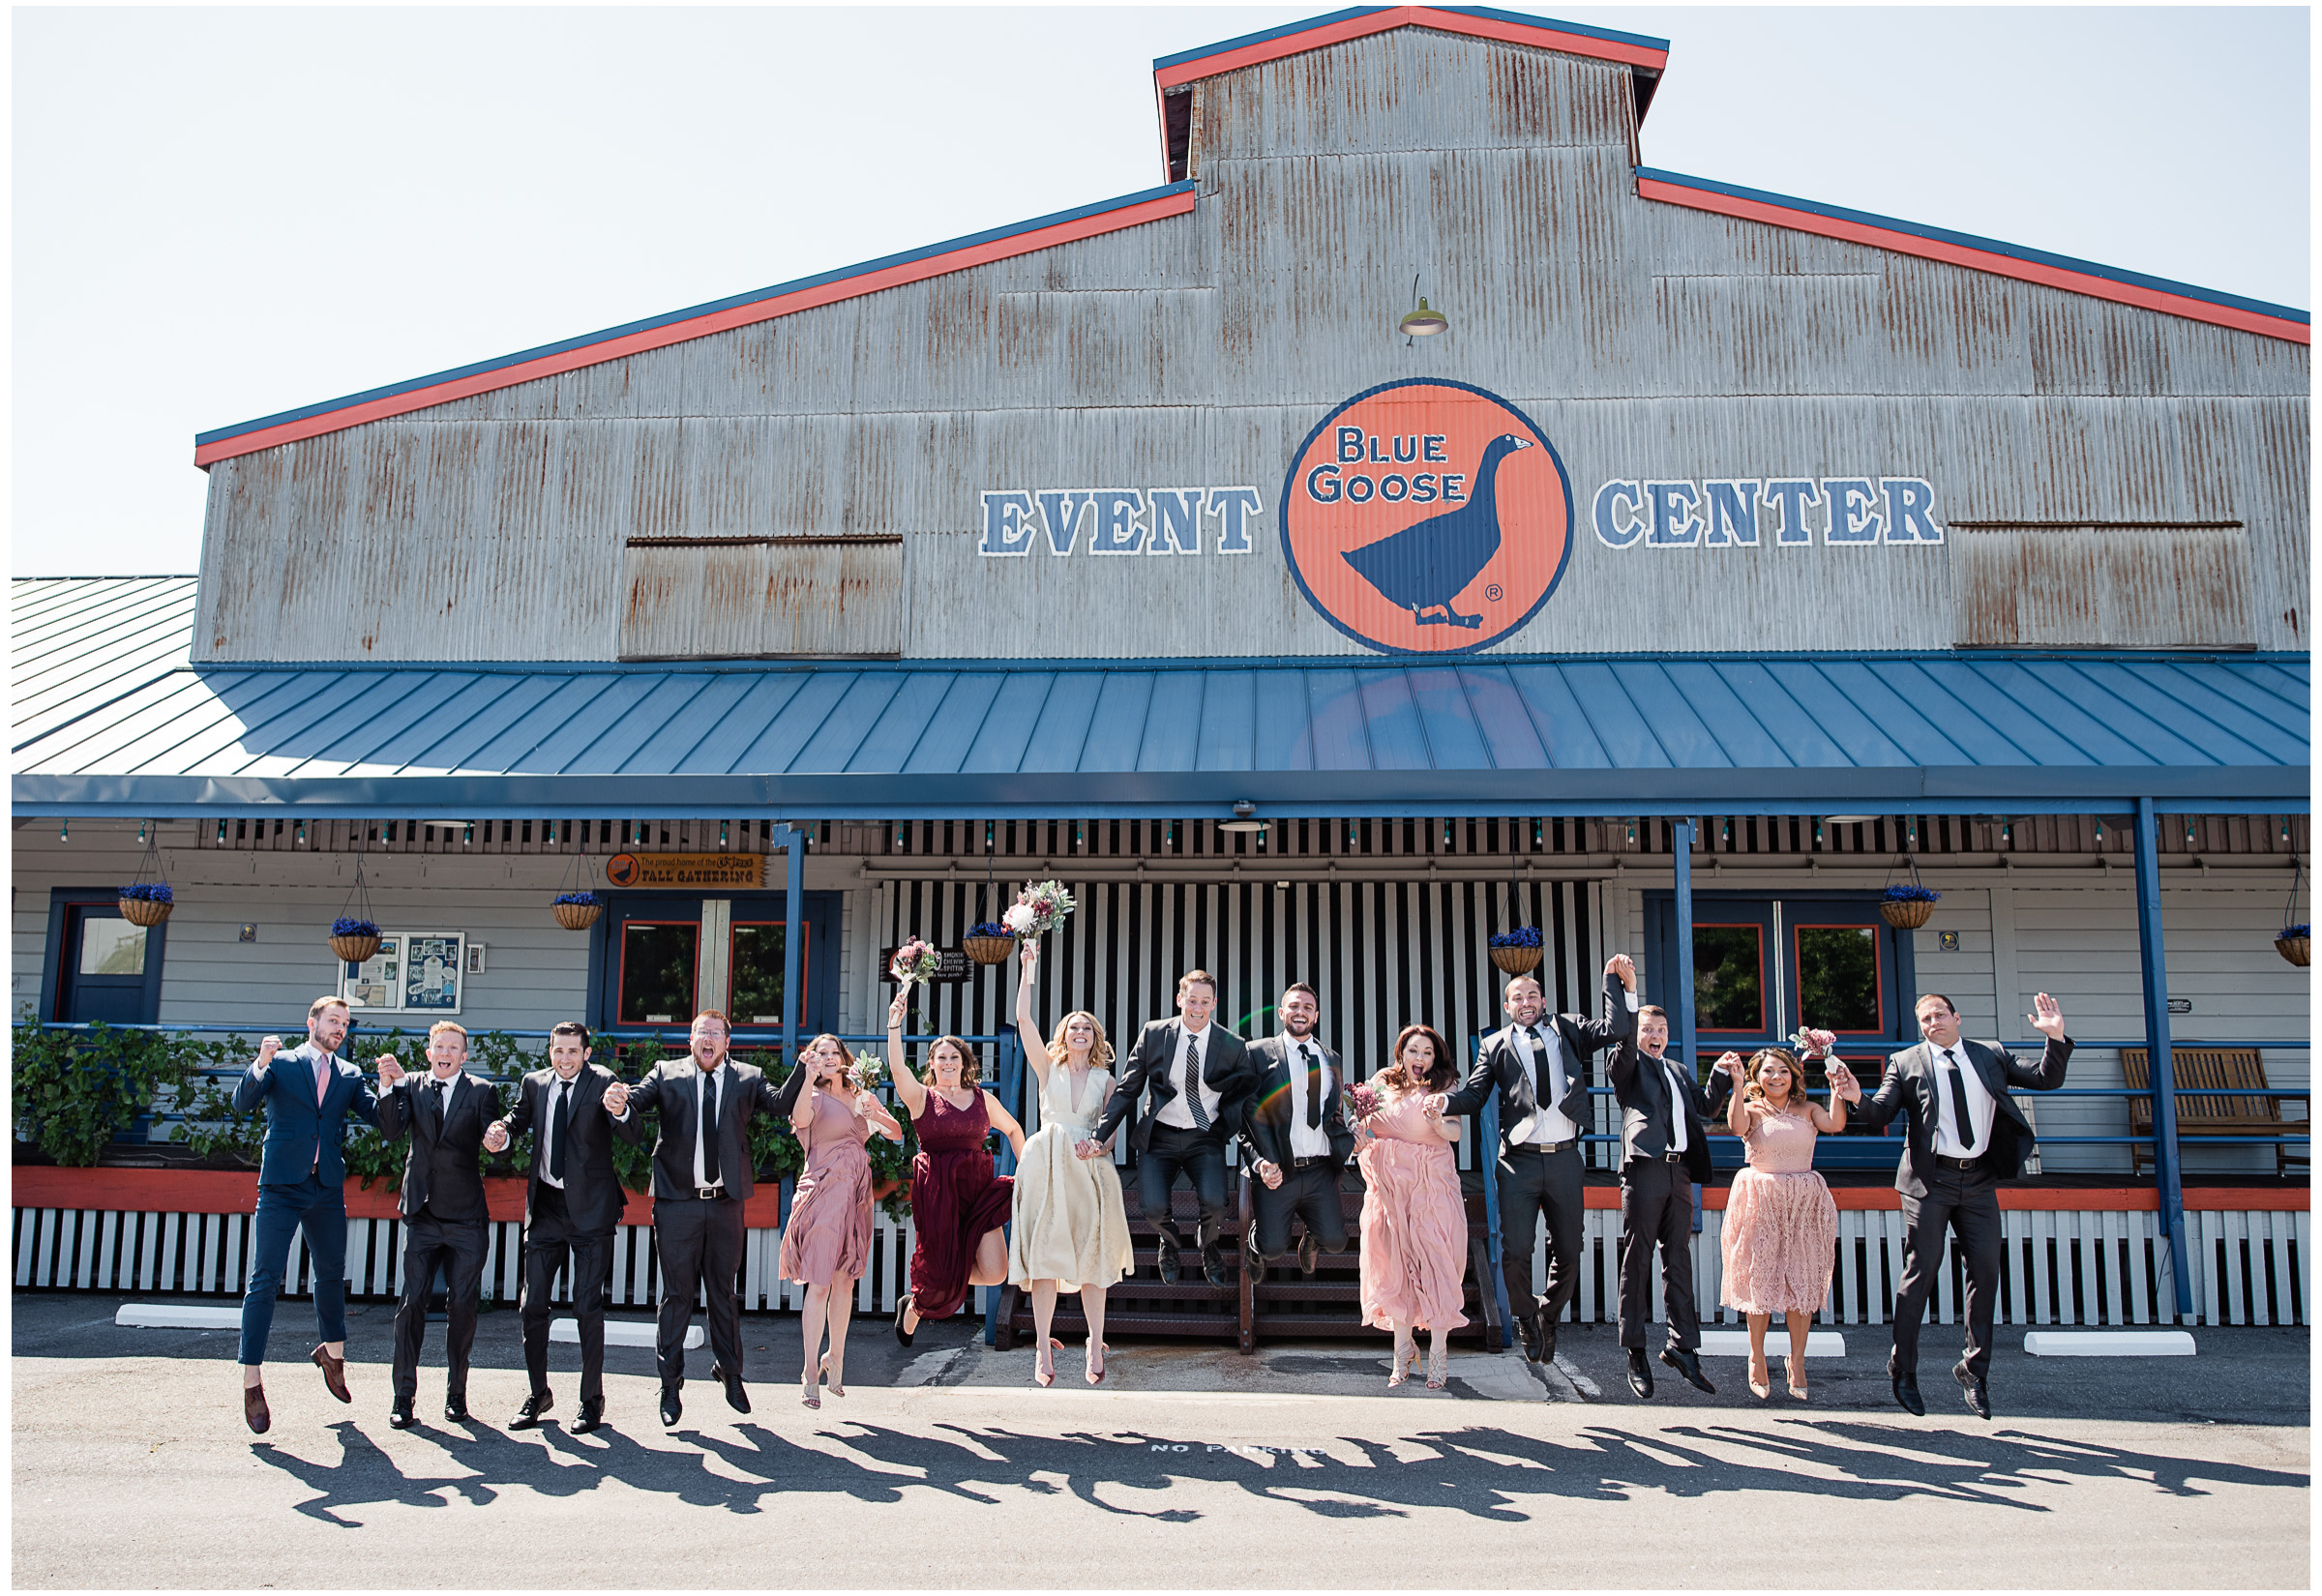 Loomis Wedding - Sacramento Photographer - Blue Goose - Justin Wilcox Photography - 1.jpg